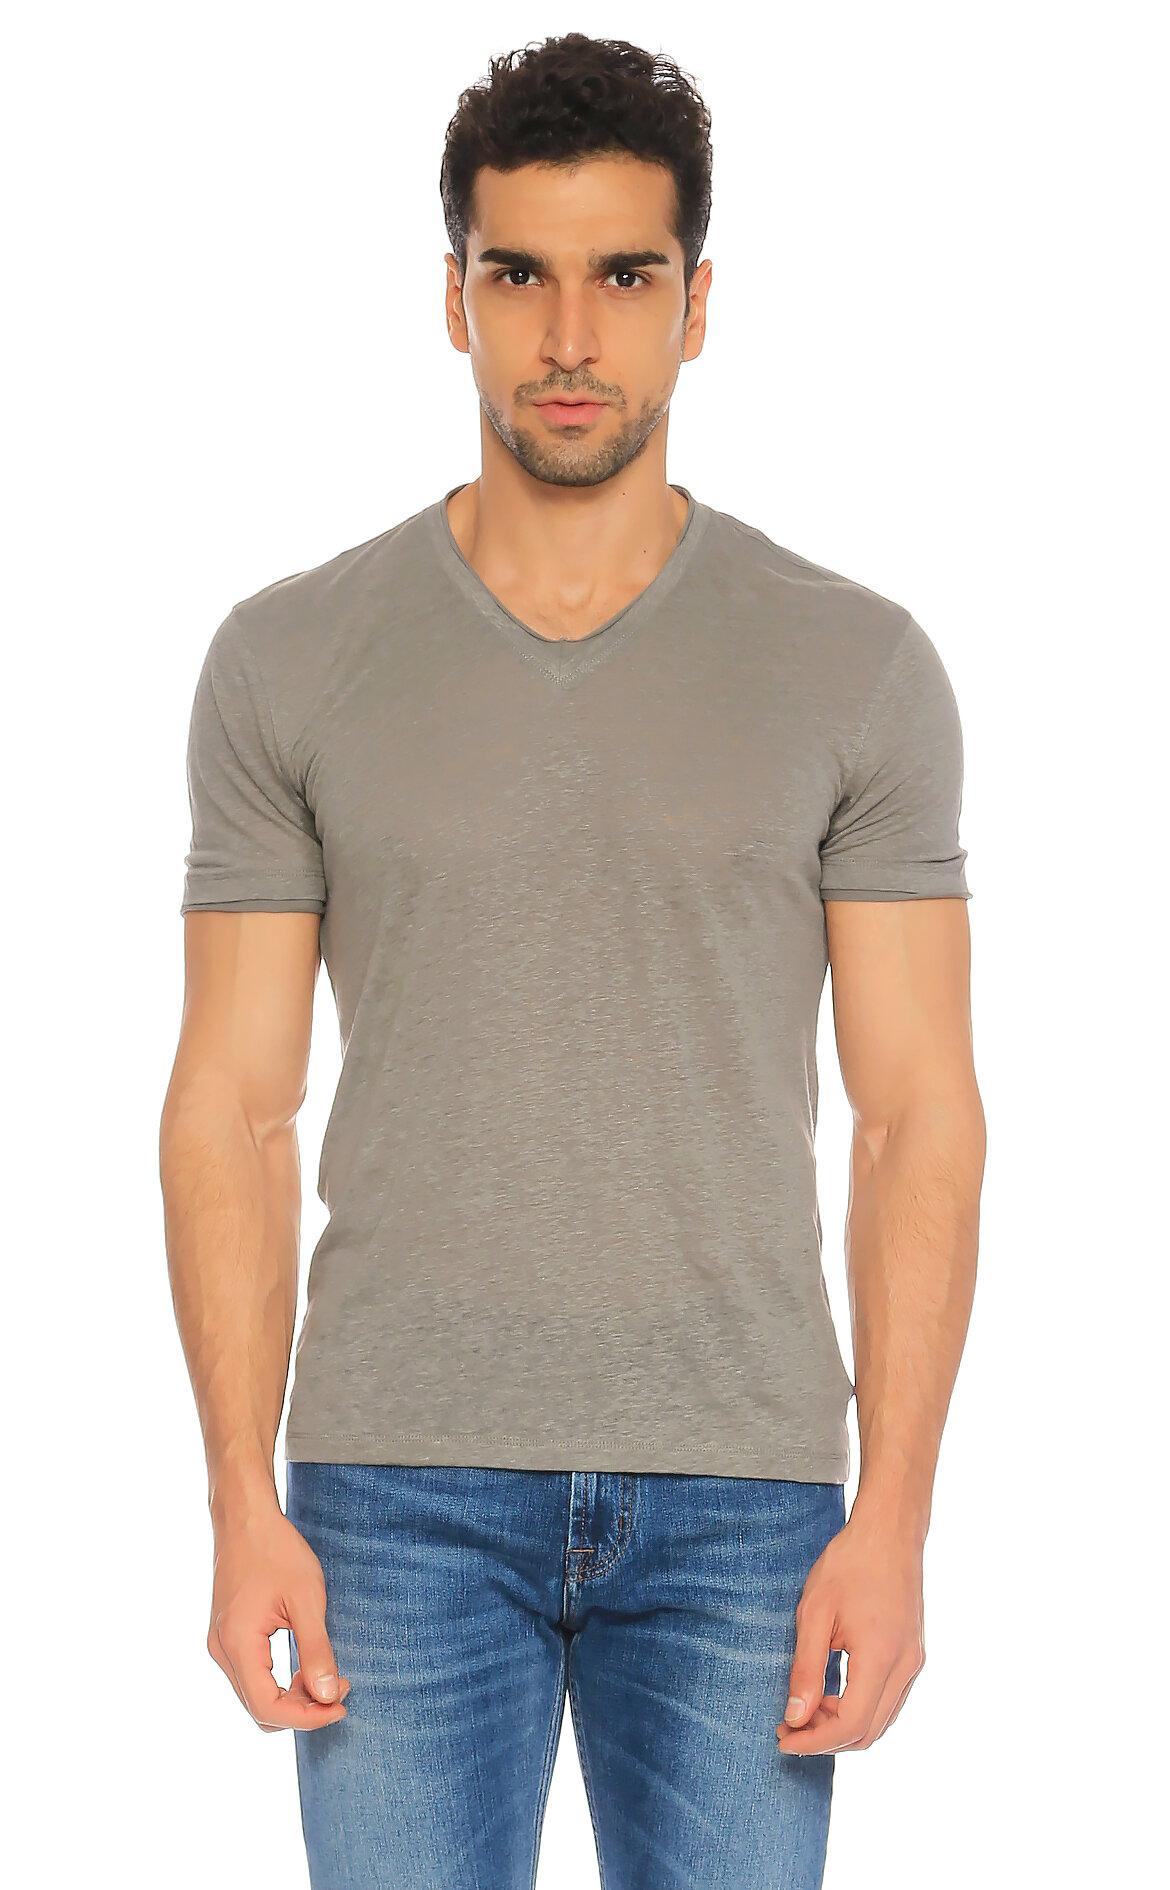 John Varvatos-John Varvatos V Yaka Gri T-Shirt